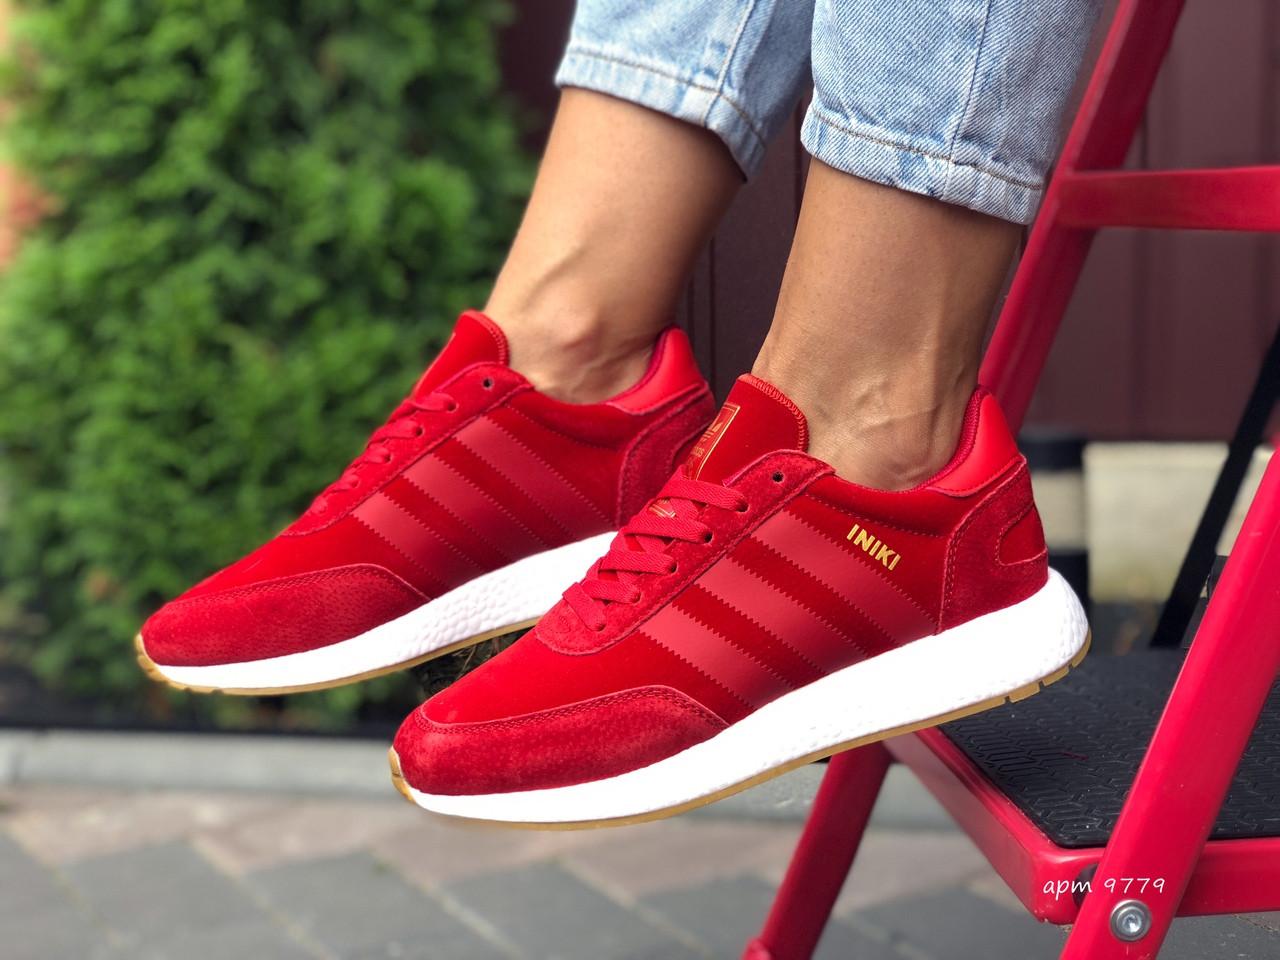 Кроссовки женские Adidas Iniki, красные / кросівки жіночі Адидас червоні Иники (Топ реплика ААА+)